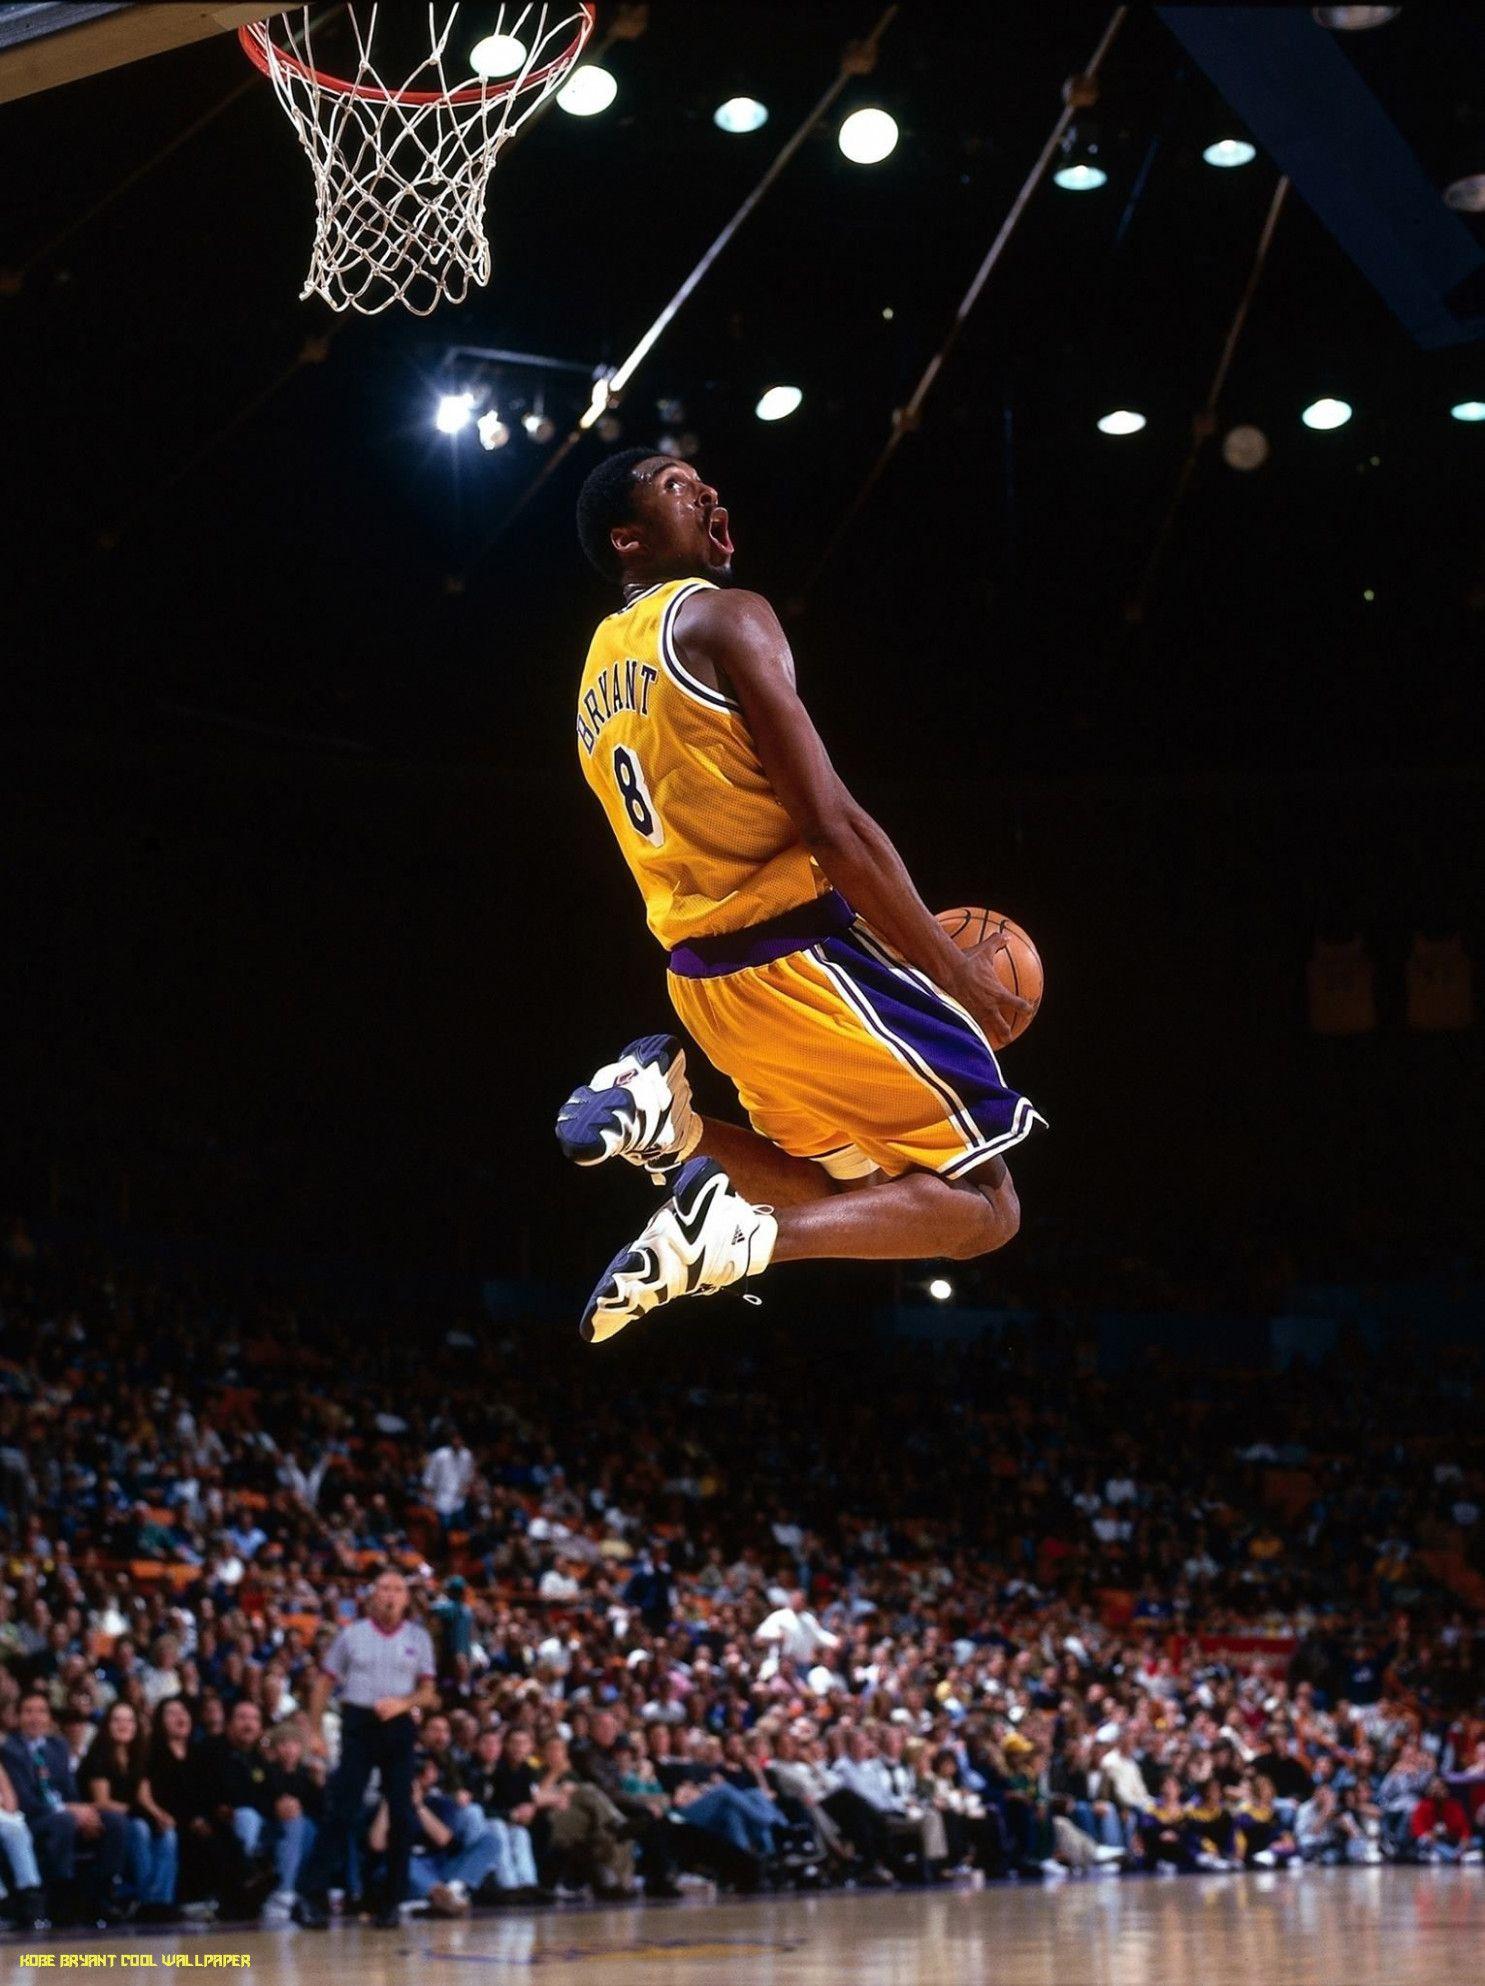 Ten Easy Rules Of Kobe Bryant Cool Wallpaper Kobe Bryant Cool Wallpaper In 2020 Kobe Bryant Iphone Wallpaper Kobe Bryant Wallpaper Kobe Bryant Poster